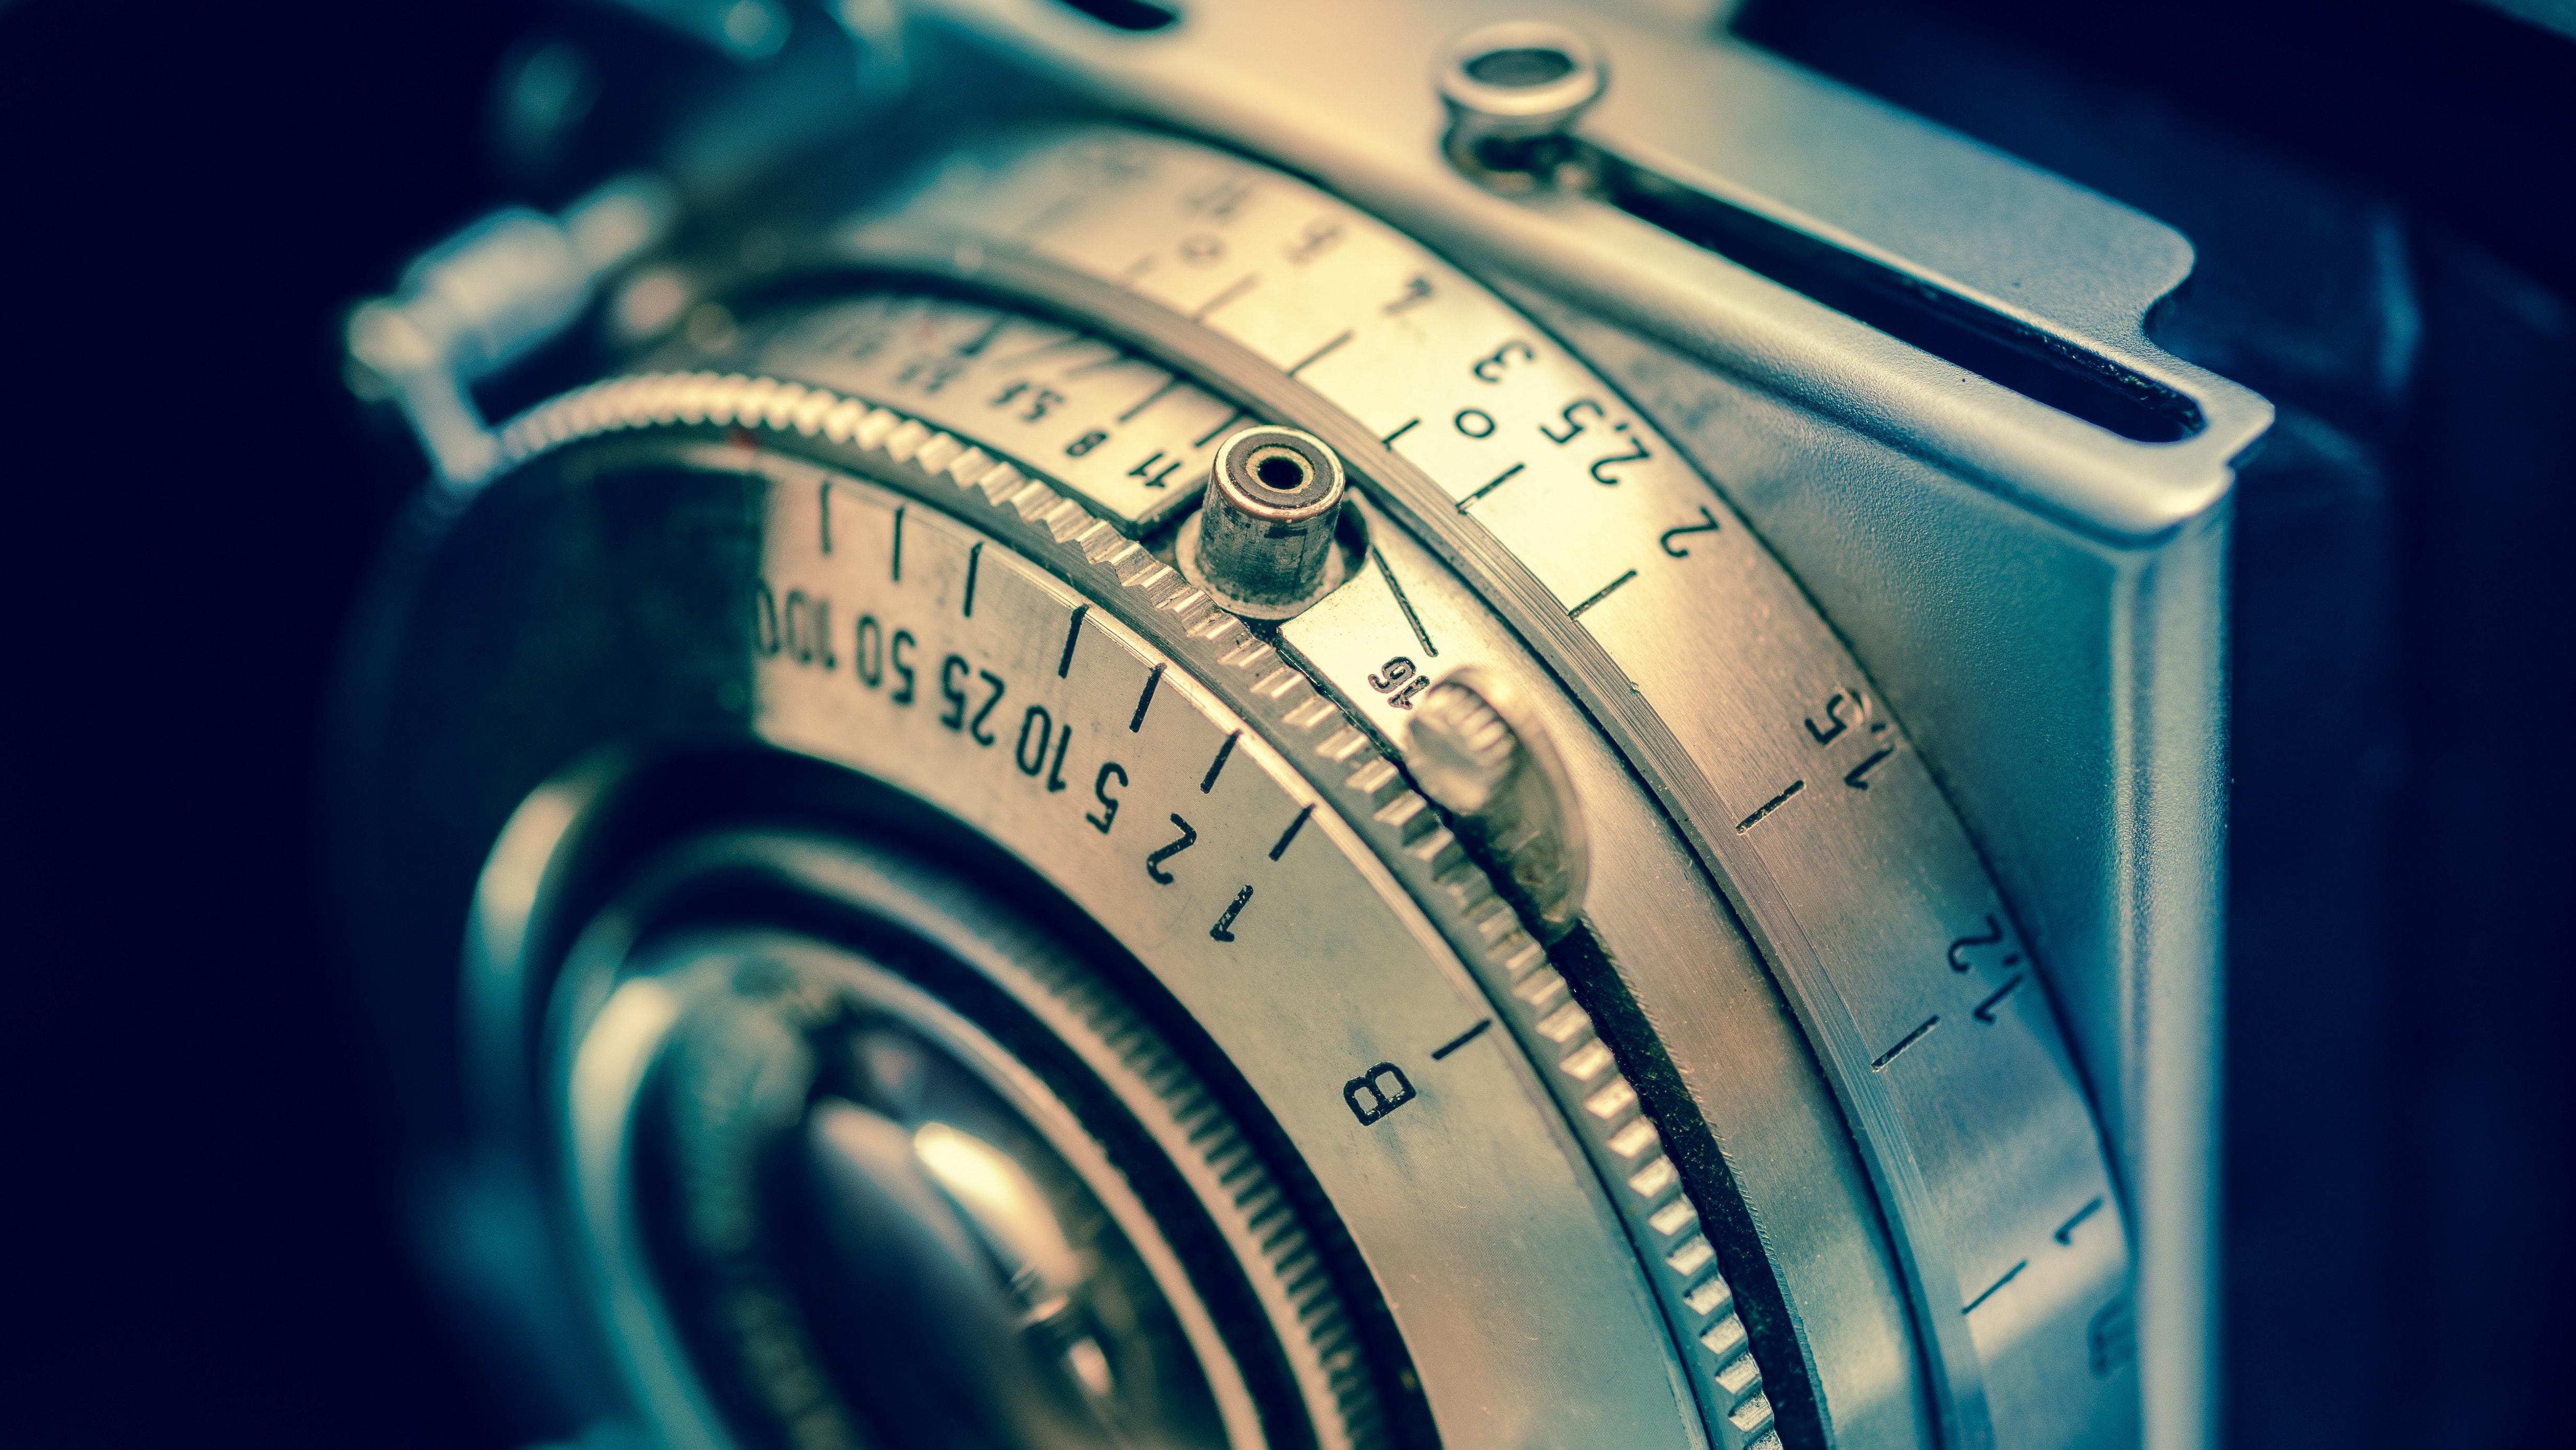 0195 retro vintage camcorder 8mm movie photo montage naked - 5 9